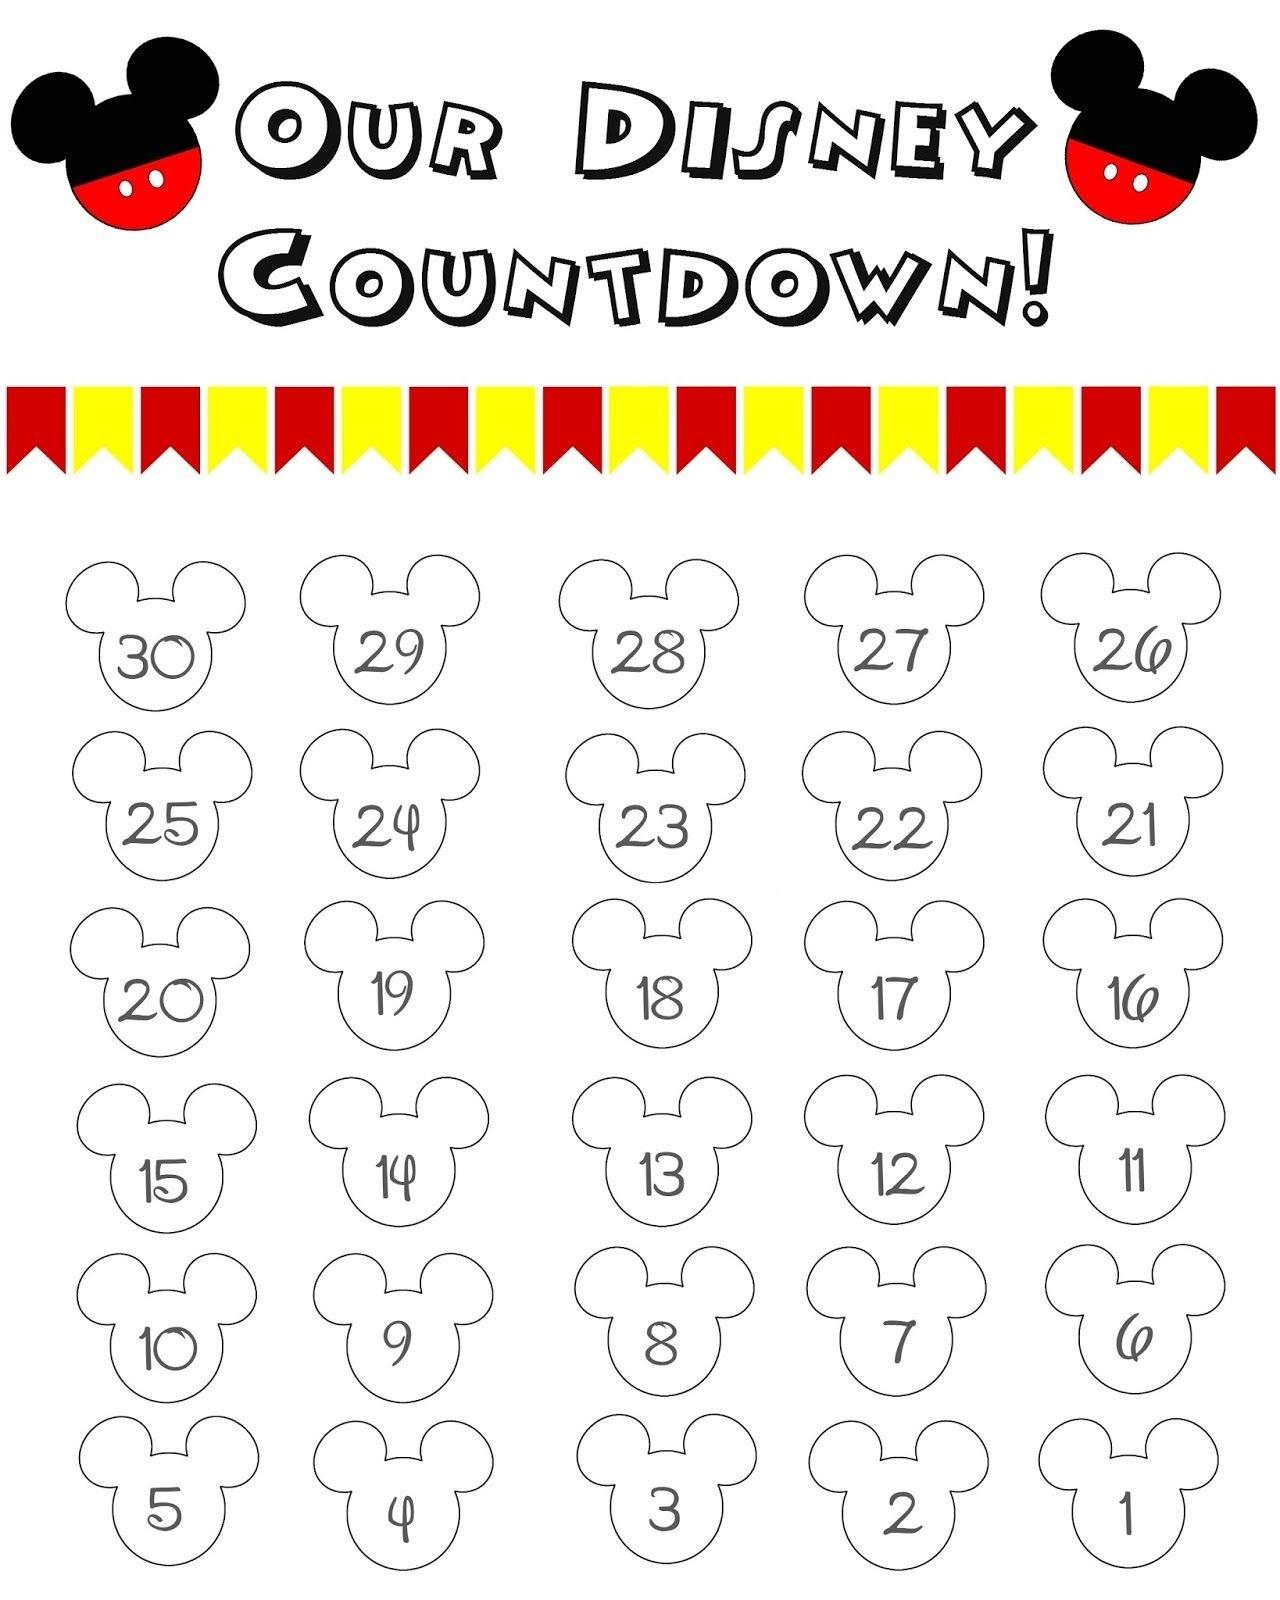 Disney World Countdown Calendar - Free Printable | Pinterest  99 Days To Disney Printable Calendar